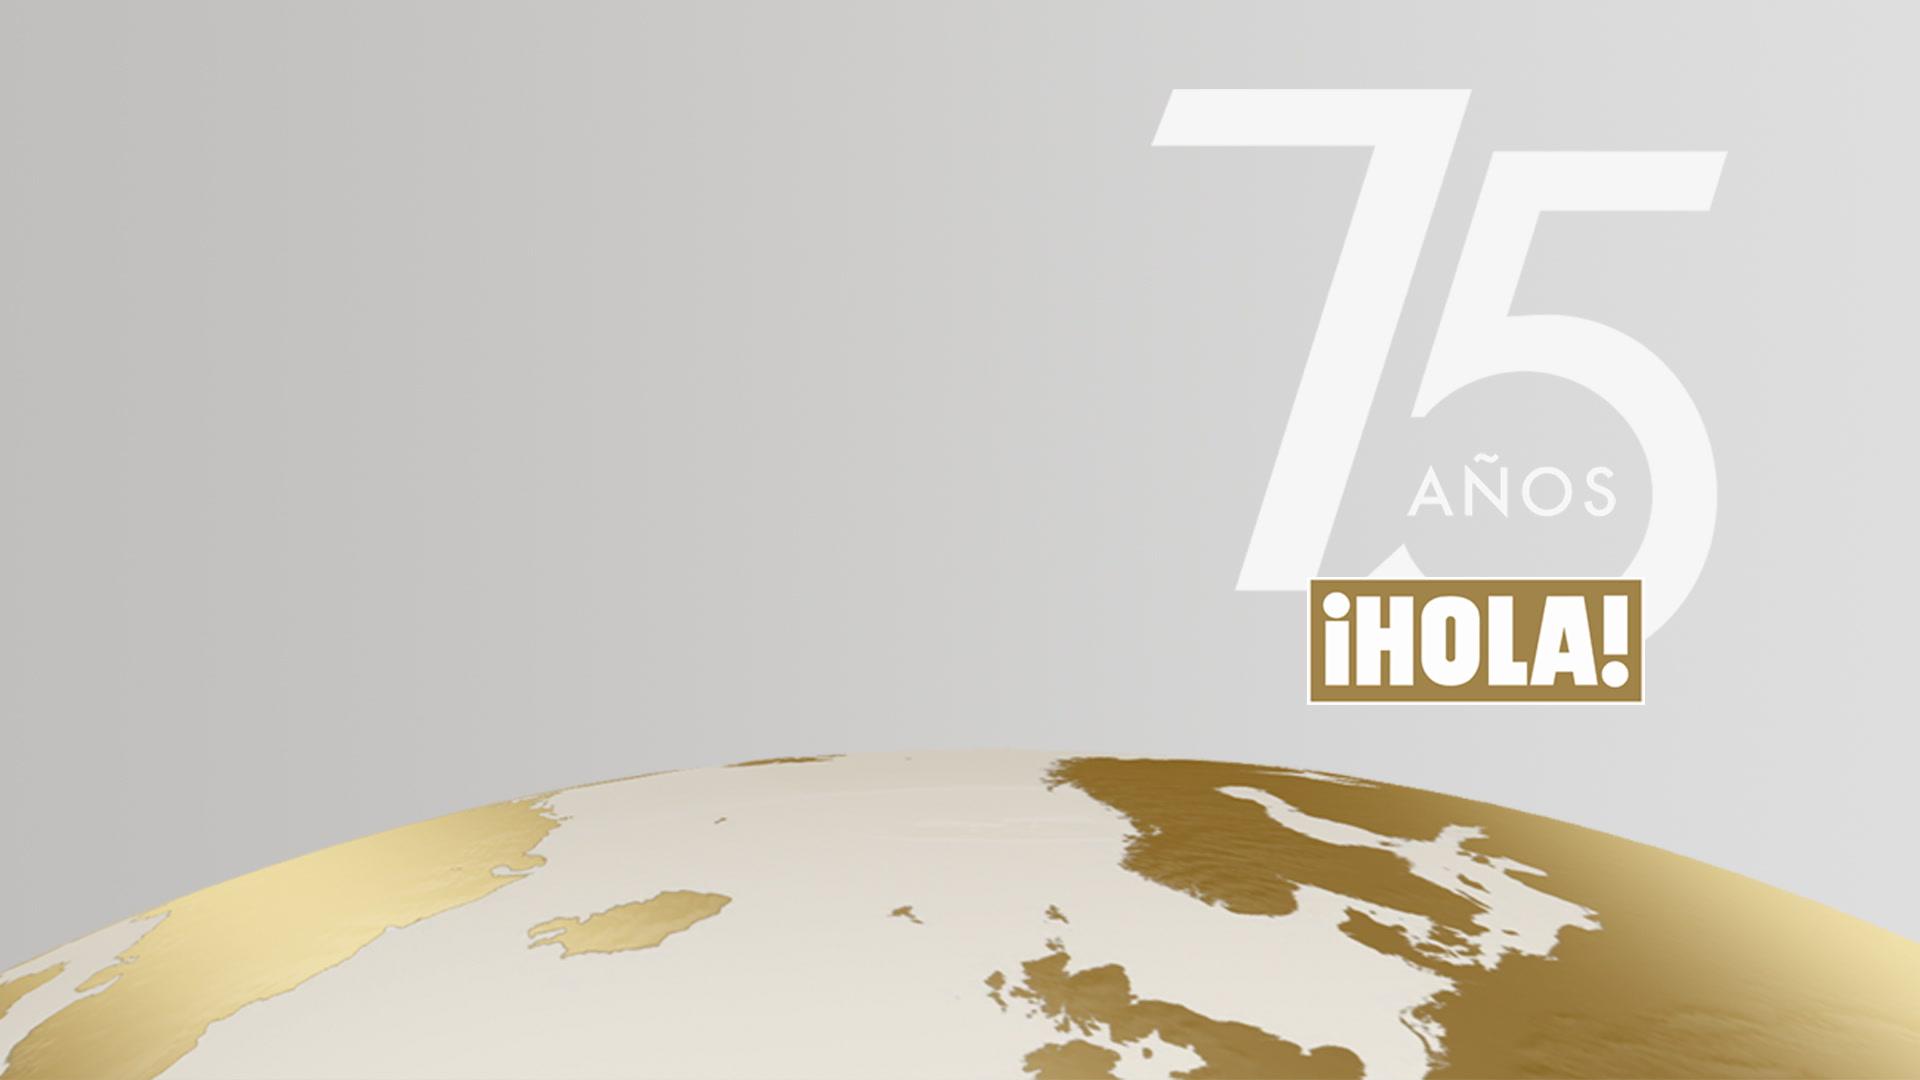 ¡HOLA!: Celebrando 75 años